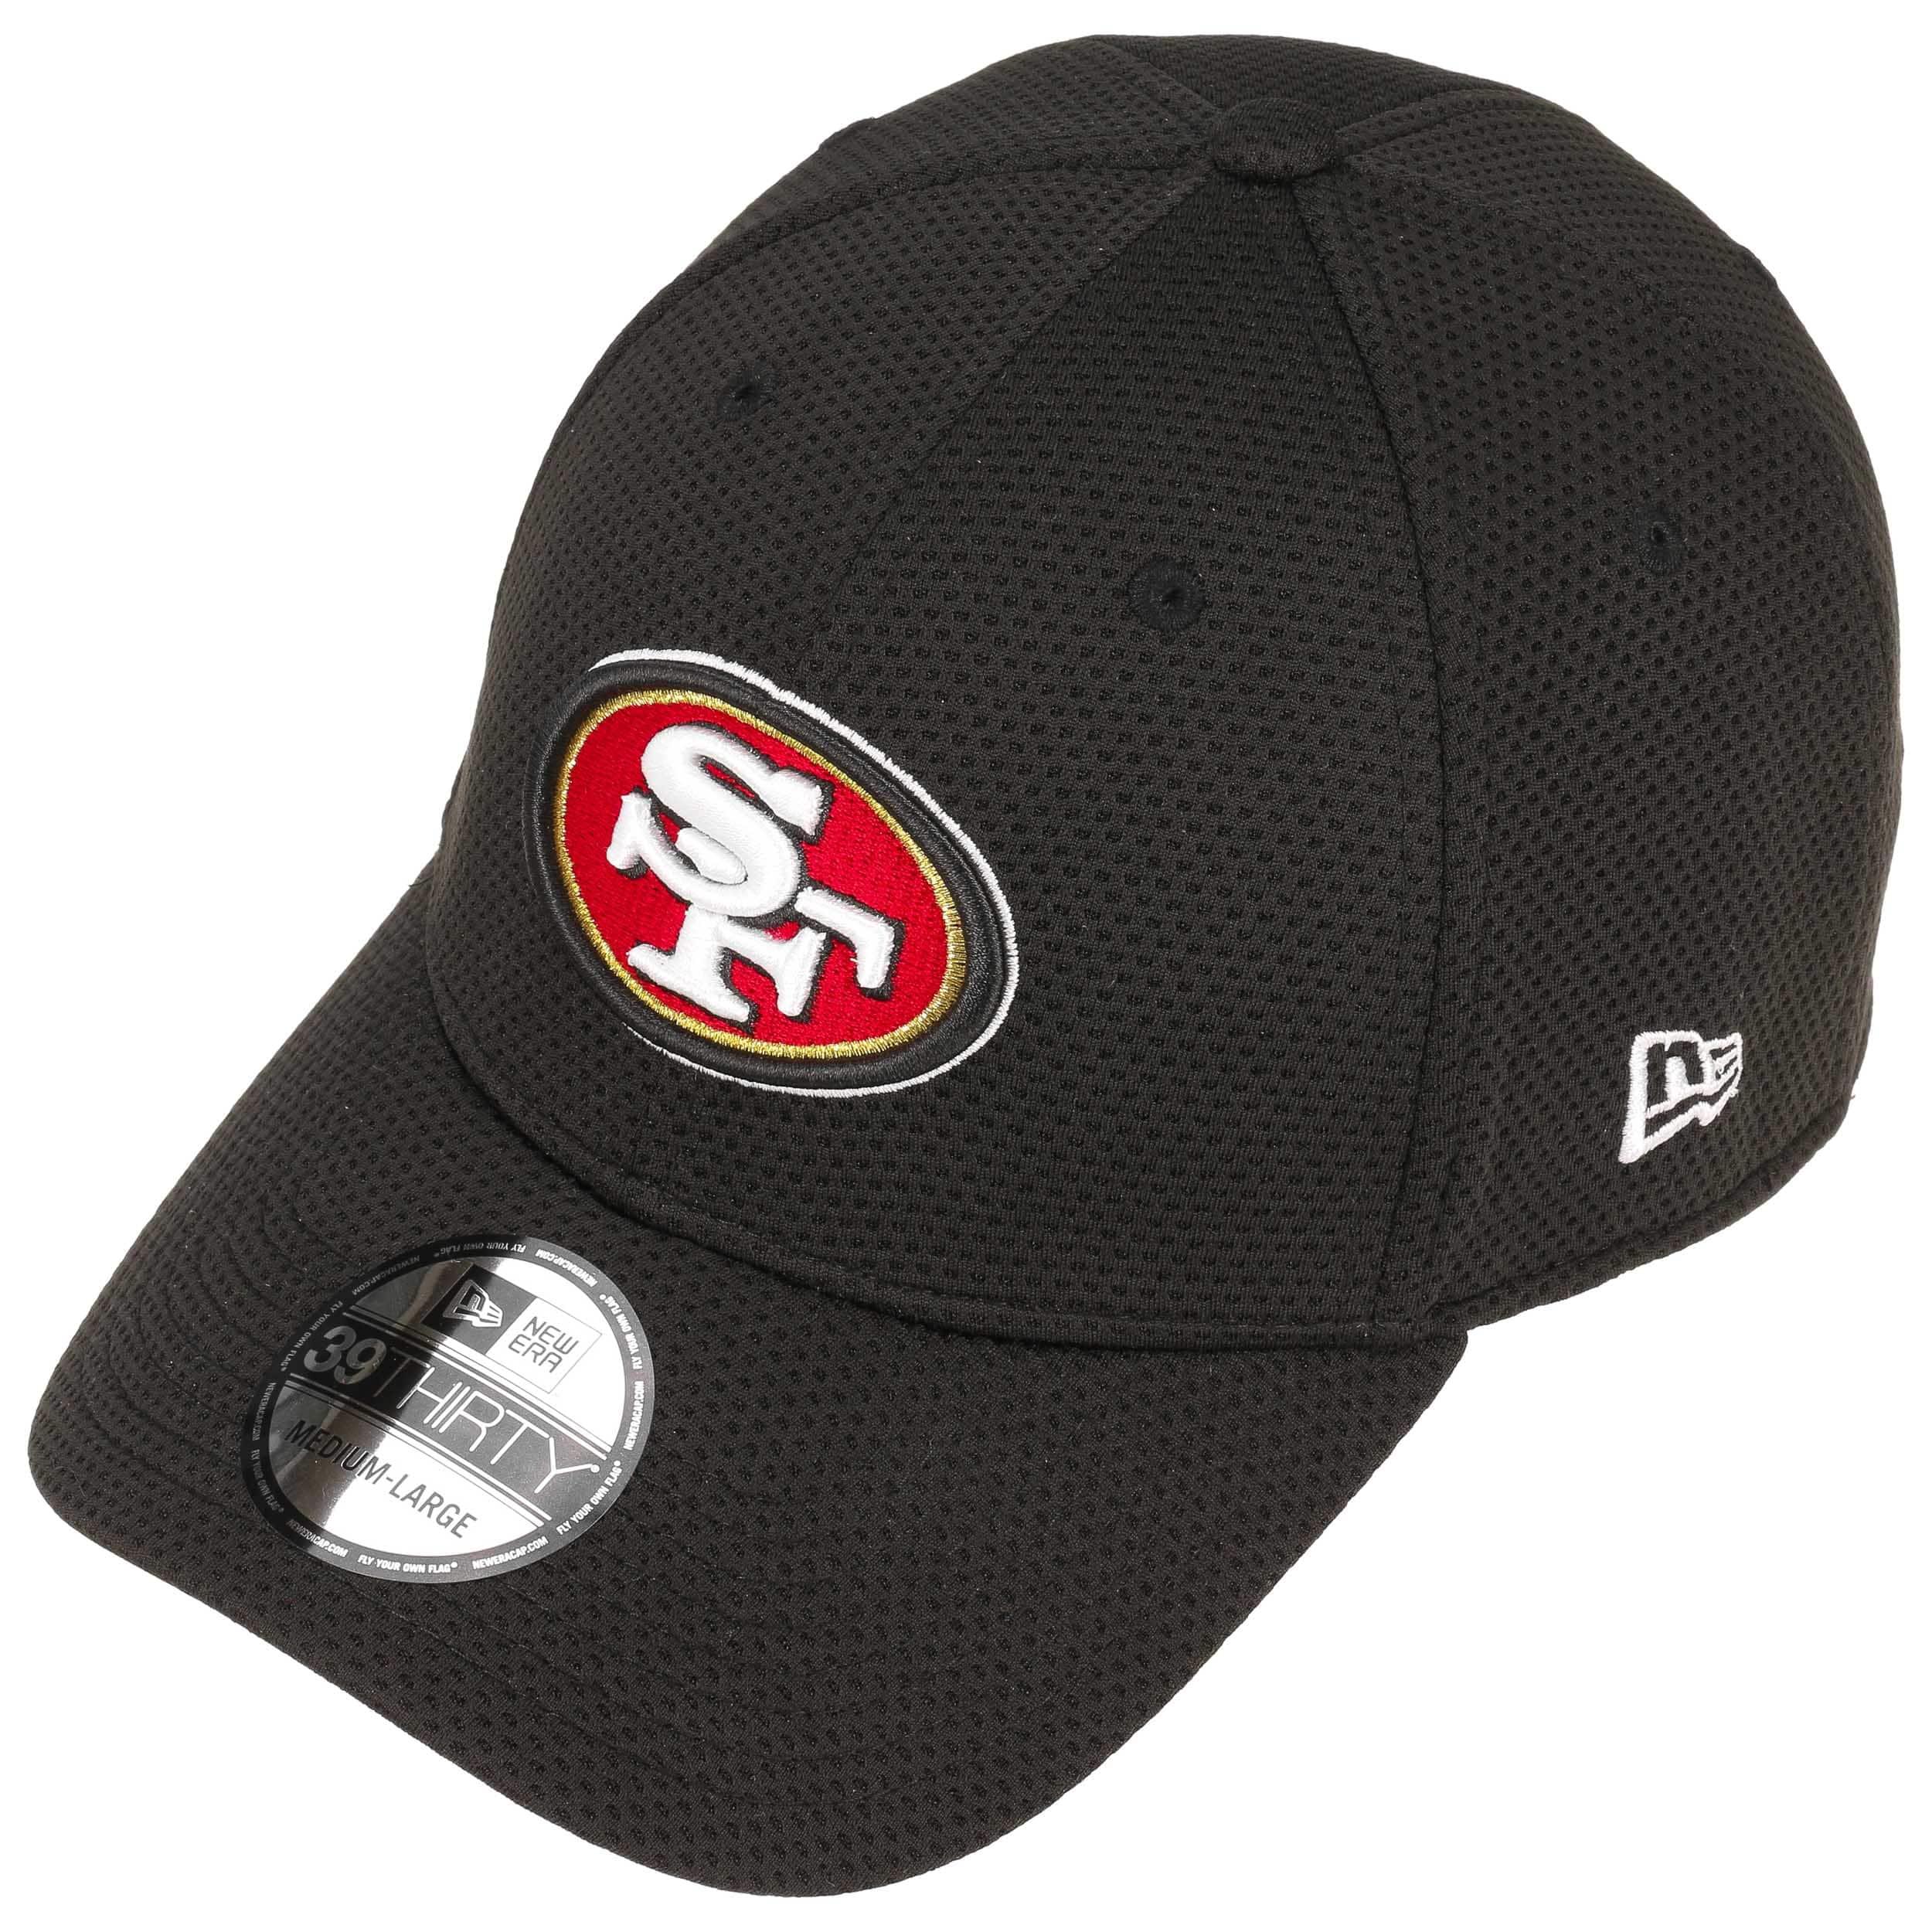 1fd360bd 39Thirty Sideline 49ers Cap by New Era - black 1 ...